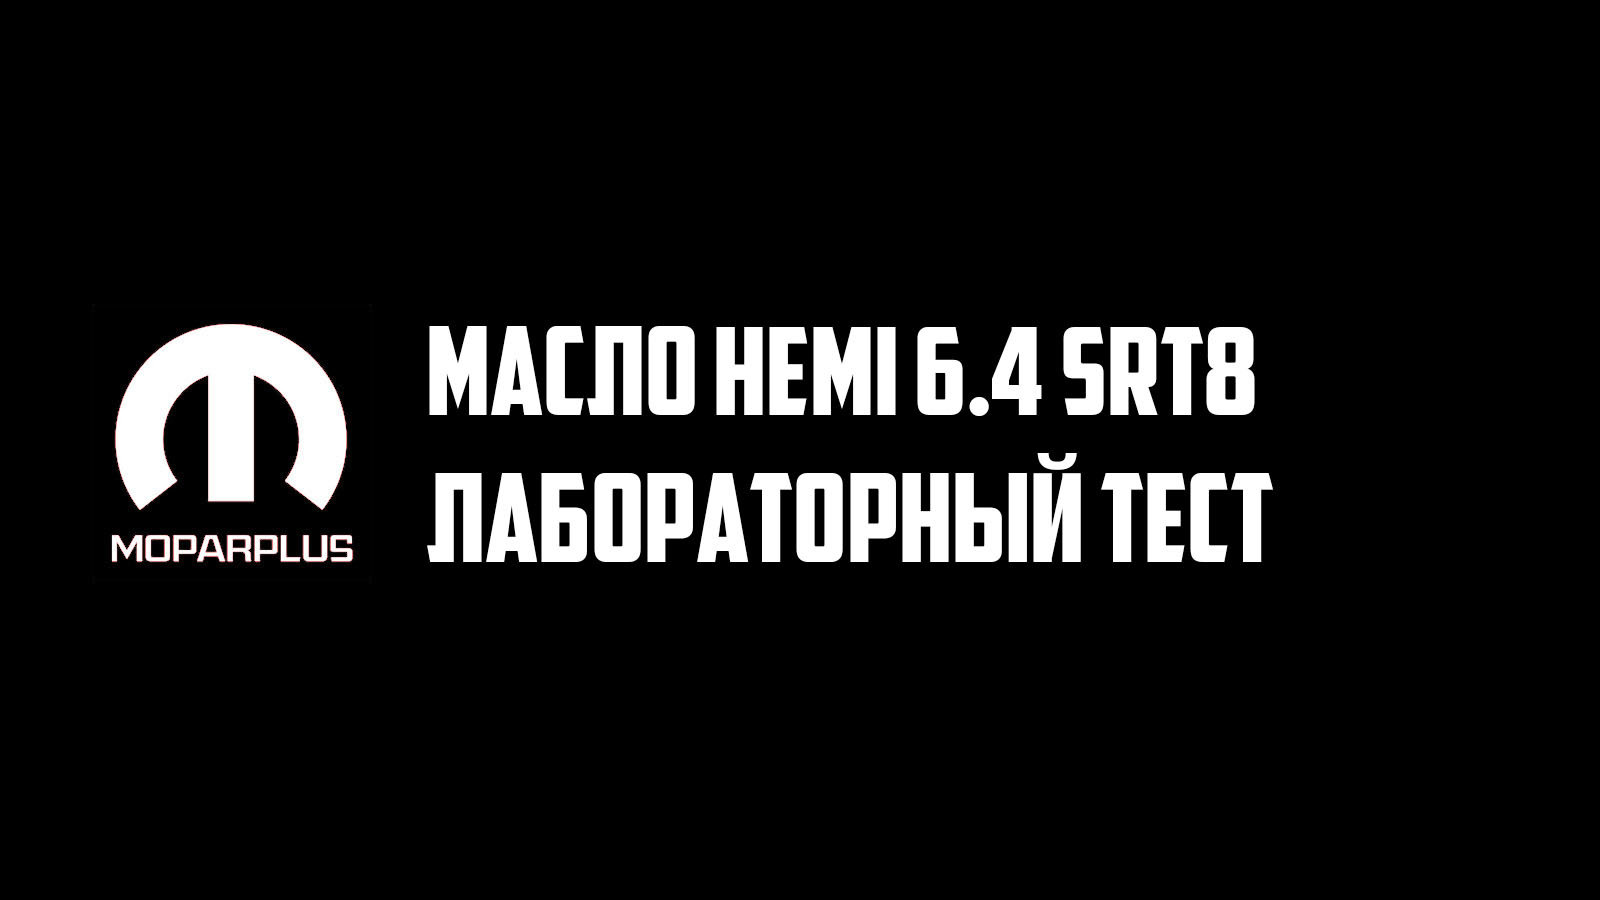 Масло для 6.4 HEMI SRT8